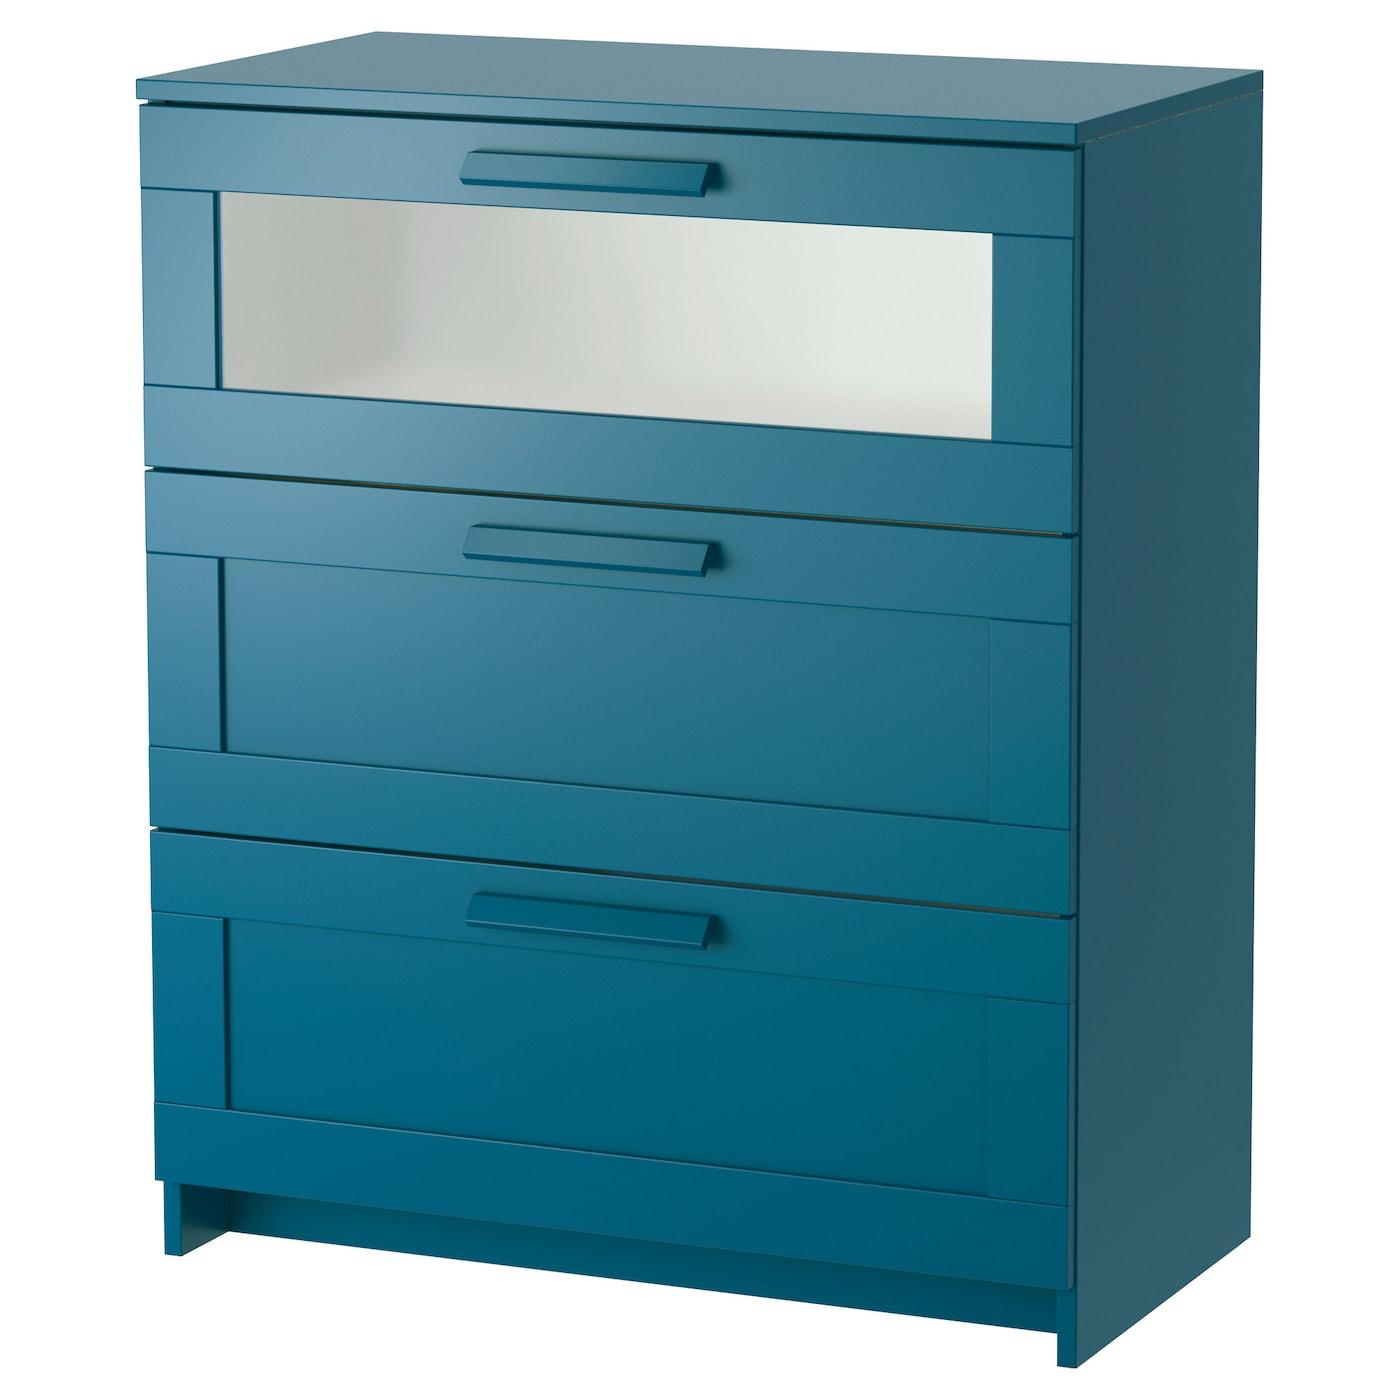 brimnes chest of 3 drawers dark green blue frosted glass. Black Bedroom Furniture Sets. Home Design Ideas